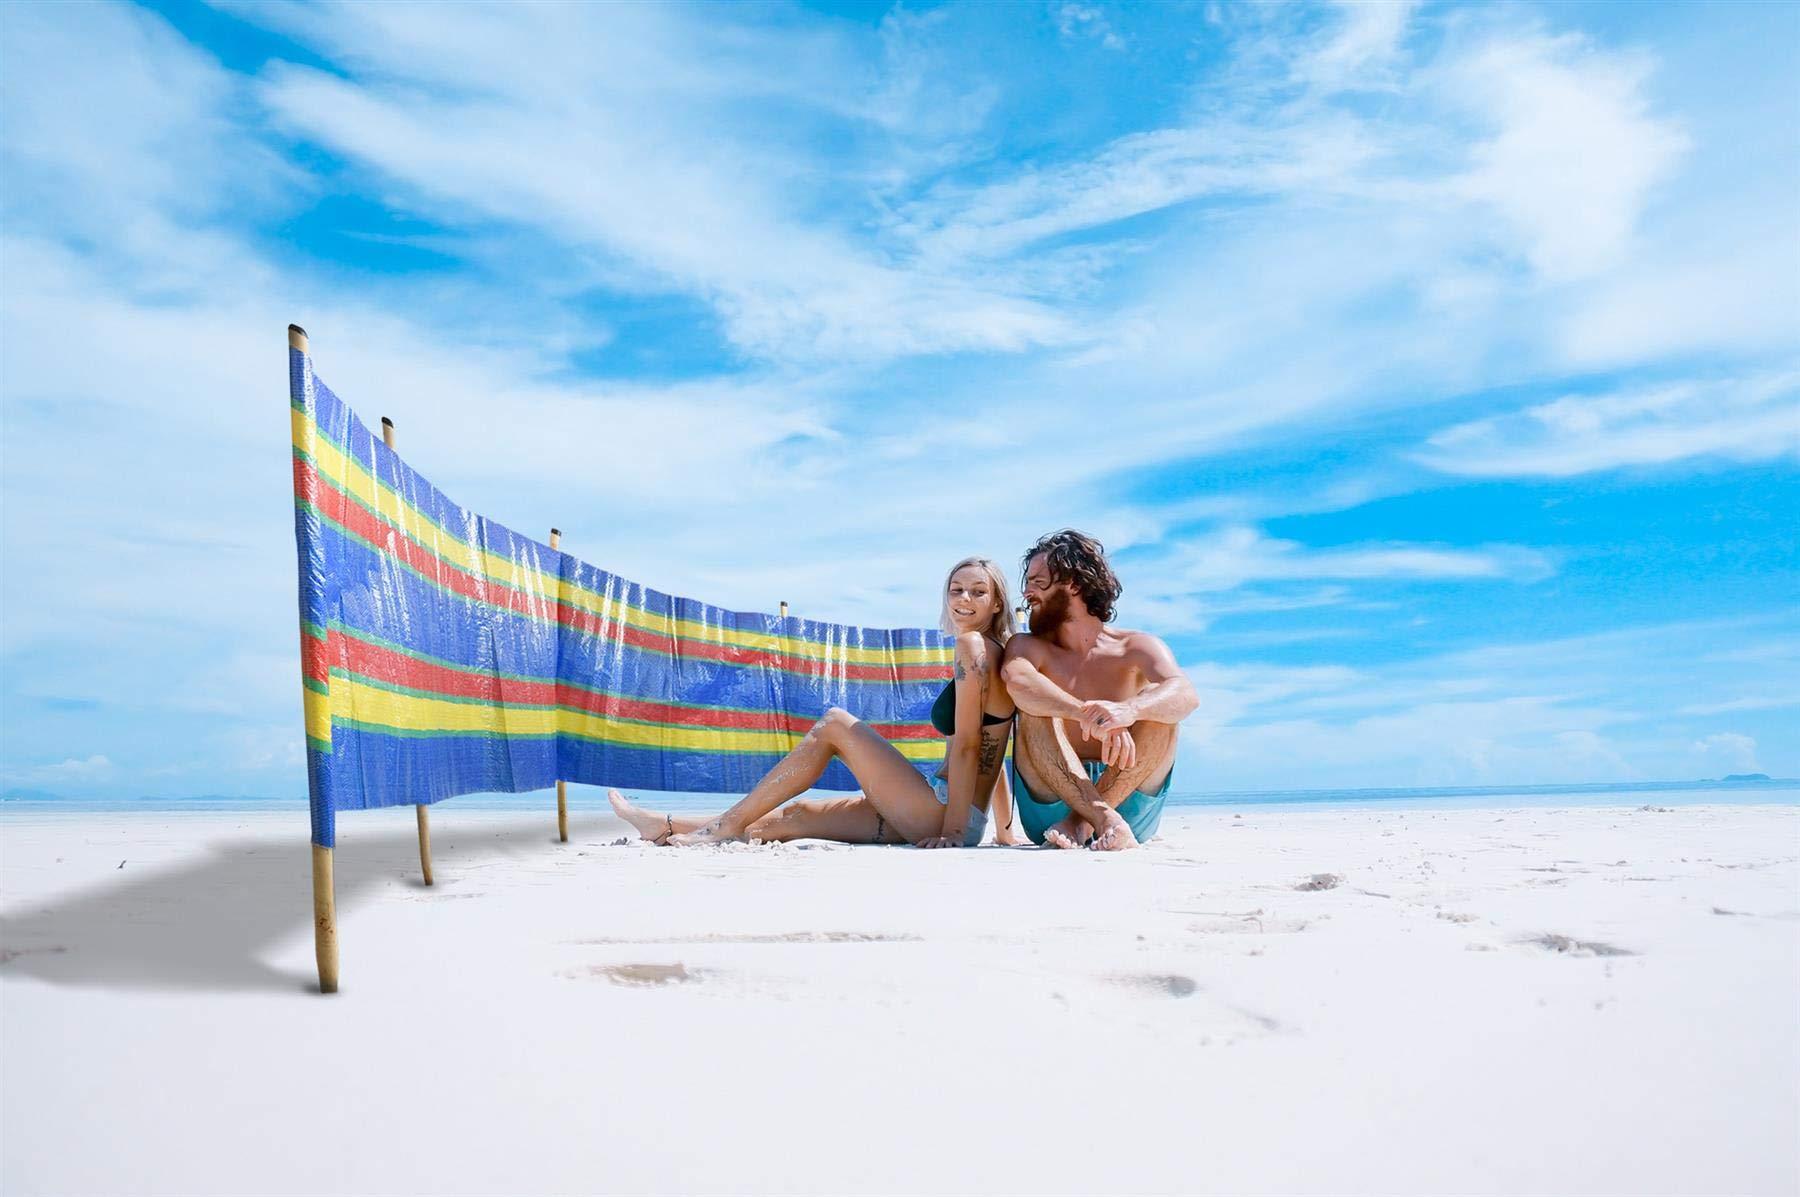 Vinsani® 4, 5, 6, 8, 10 POLE BEACH HOLIDAY CARAVAN CAMPING WINDBREAK TALL WINDBREAKERS 1